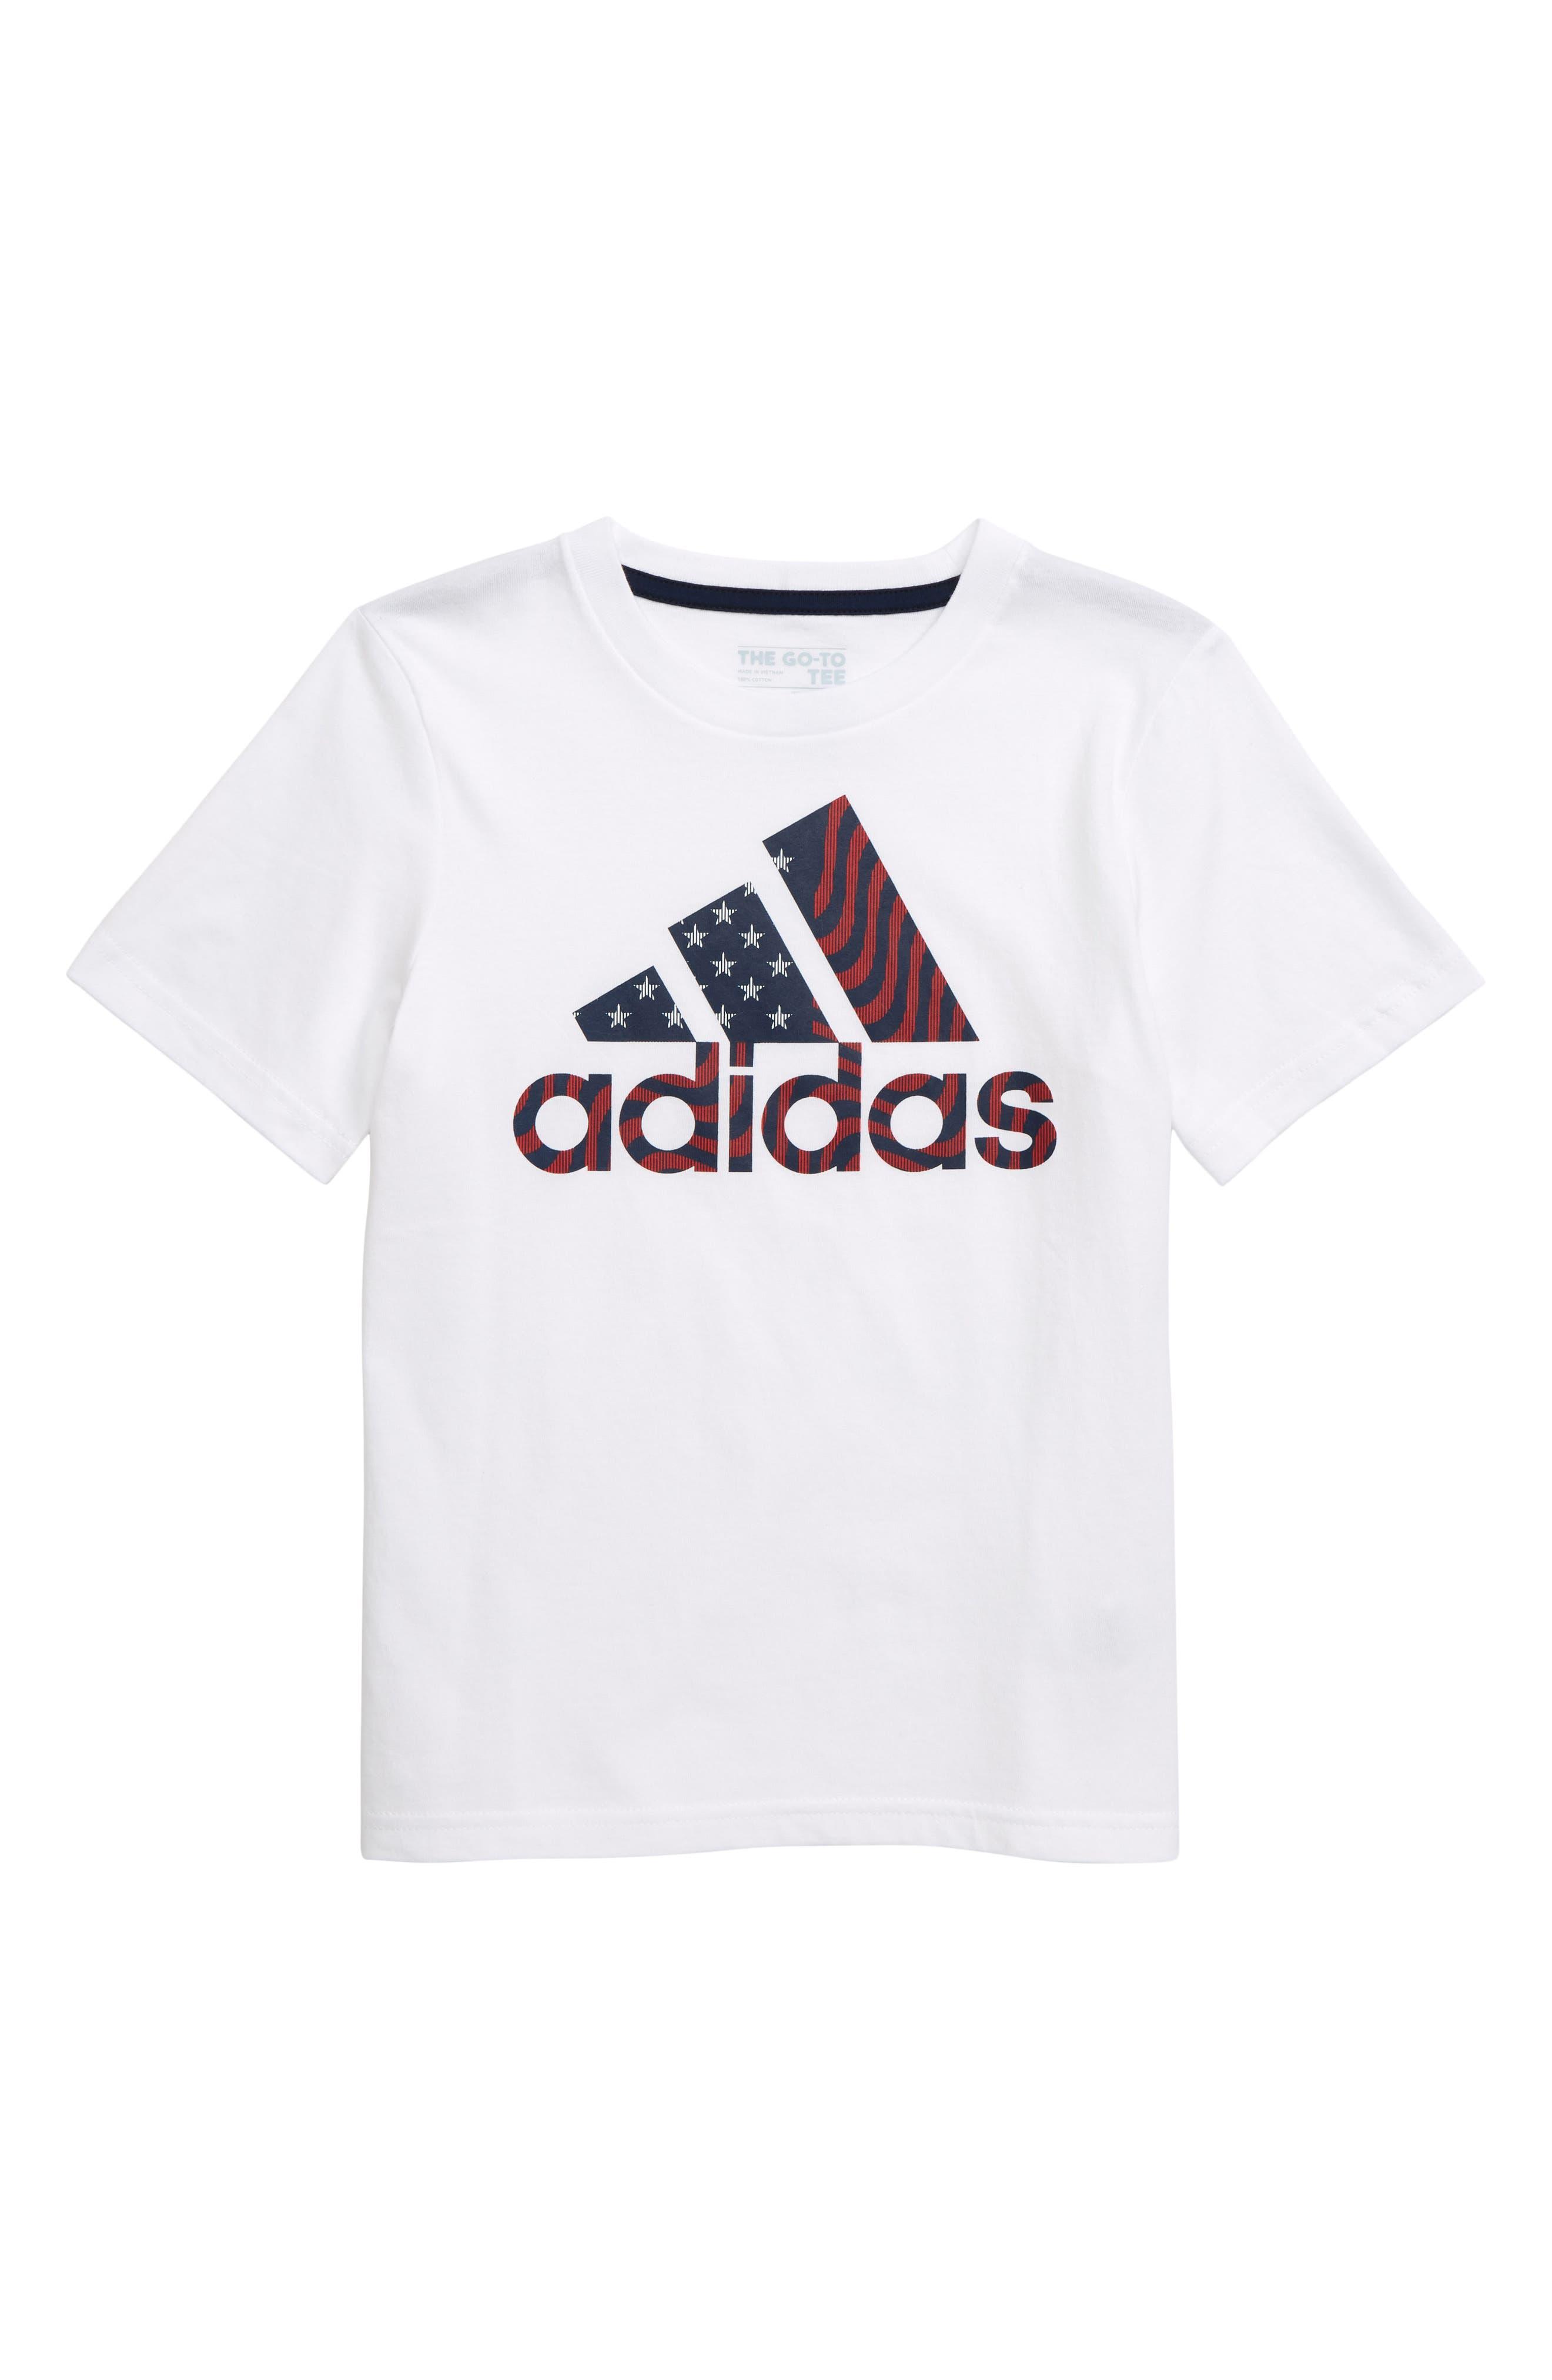 t-shirt adidas usa